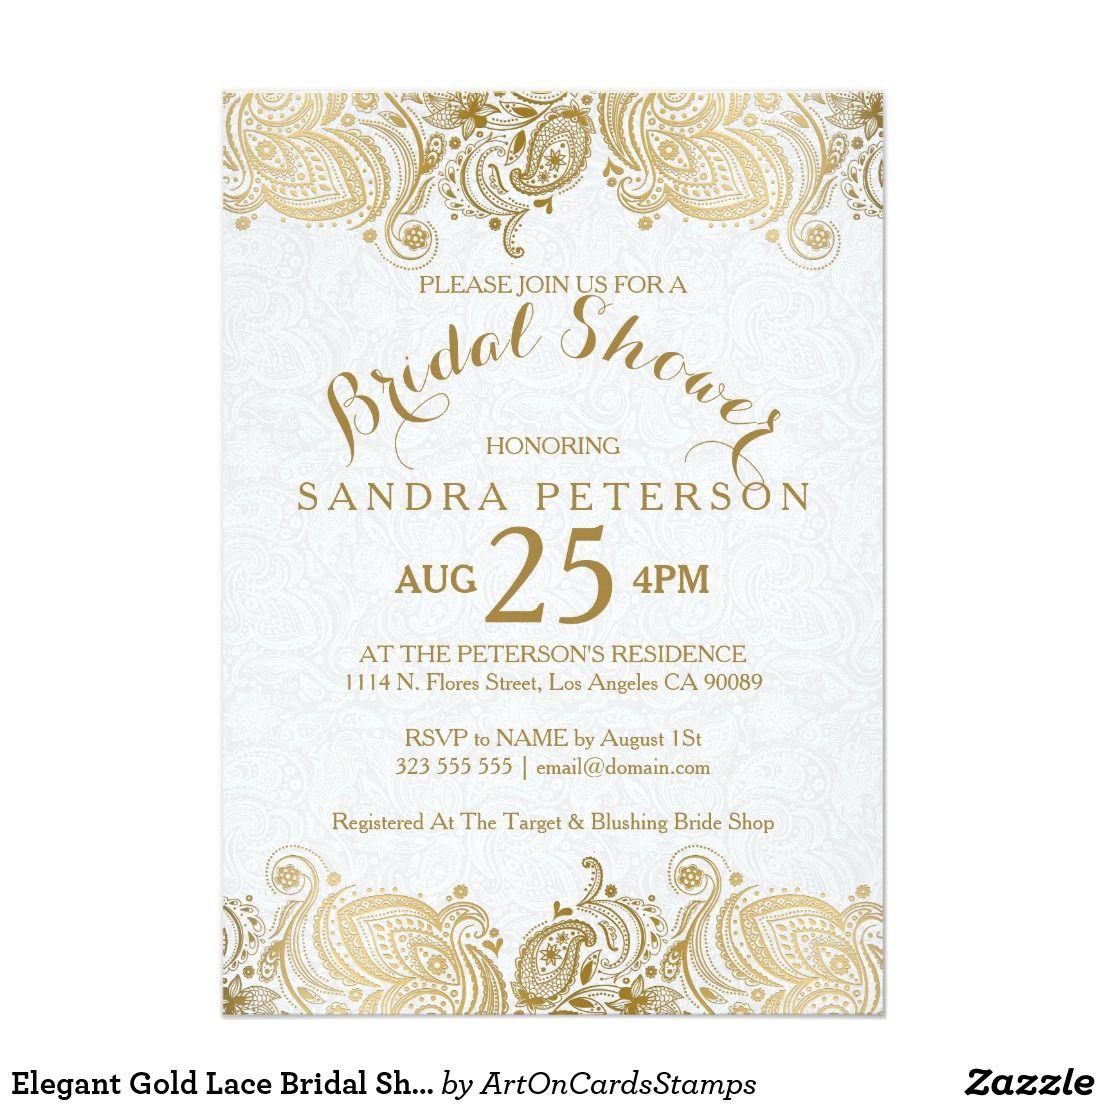 Elegant Gold Lace Bridal Shower Invitation  Zazzle.com  Bridal